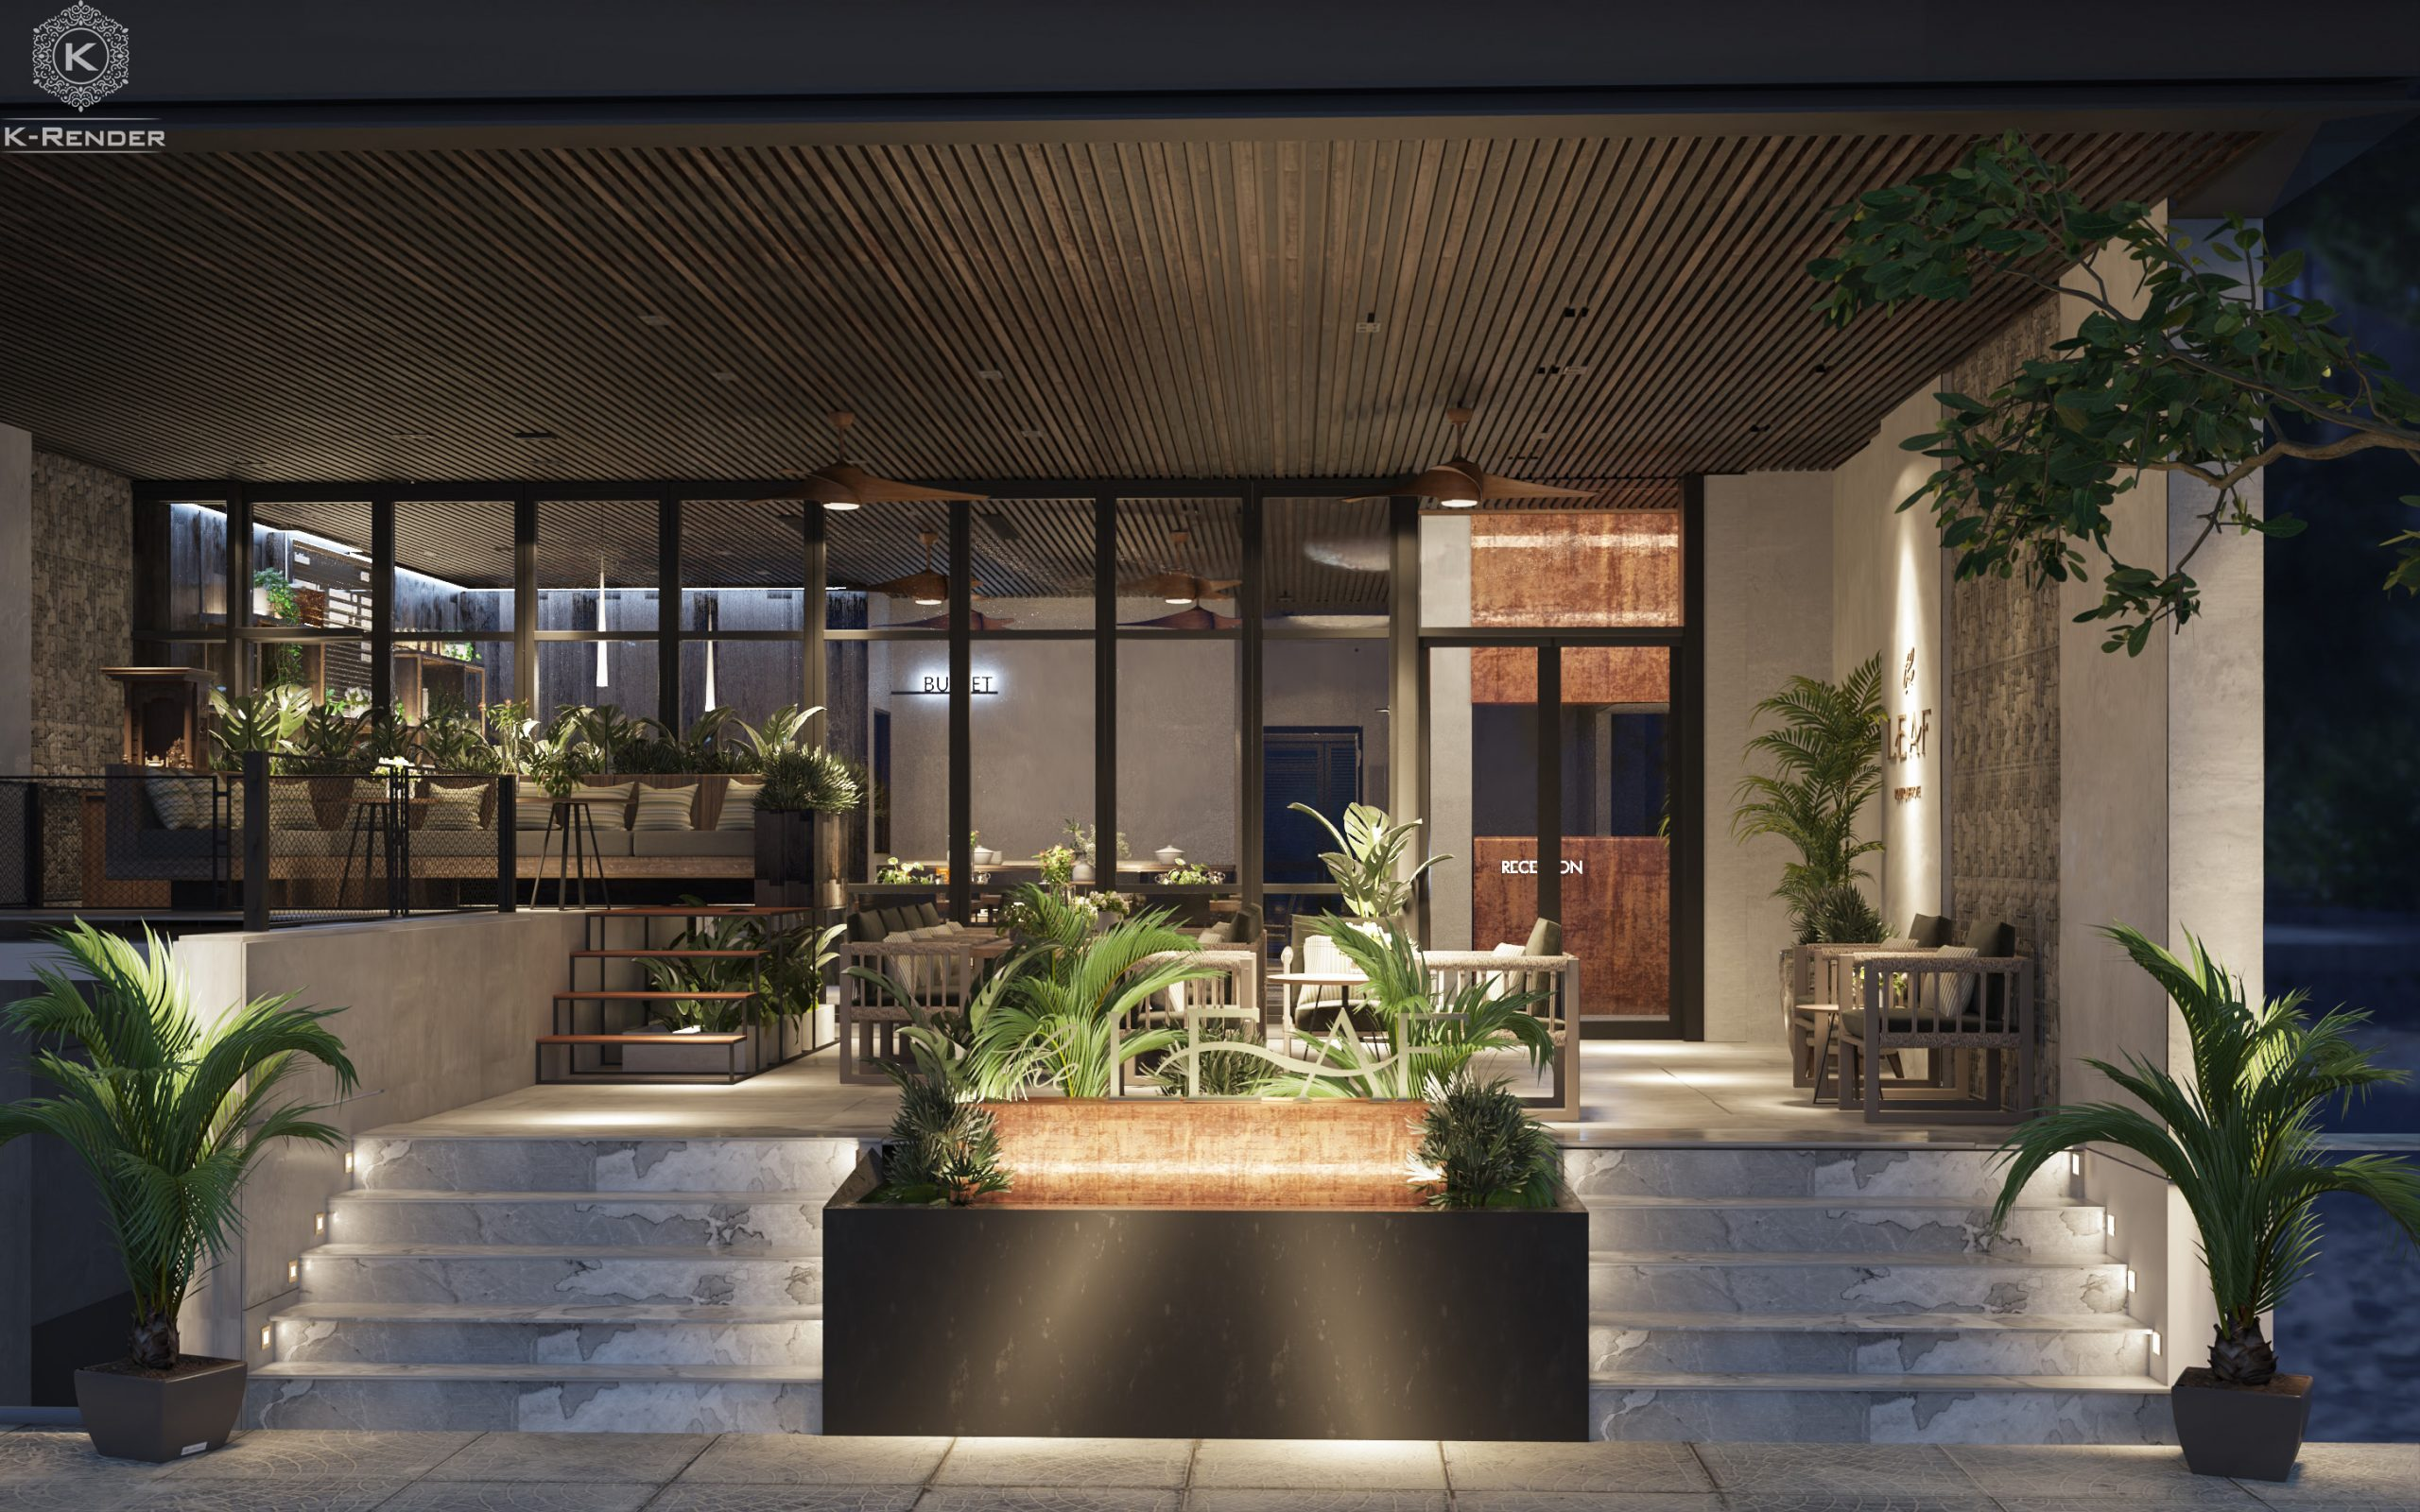 the-summer-bar-and-restaurant-project-k-render-studio-26